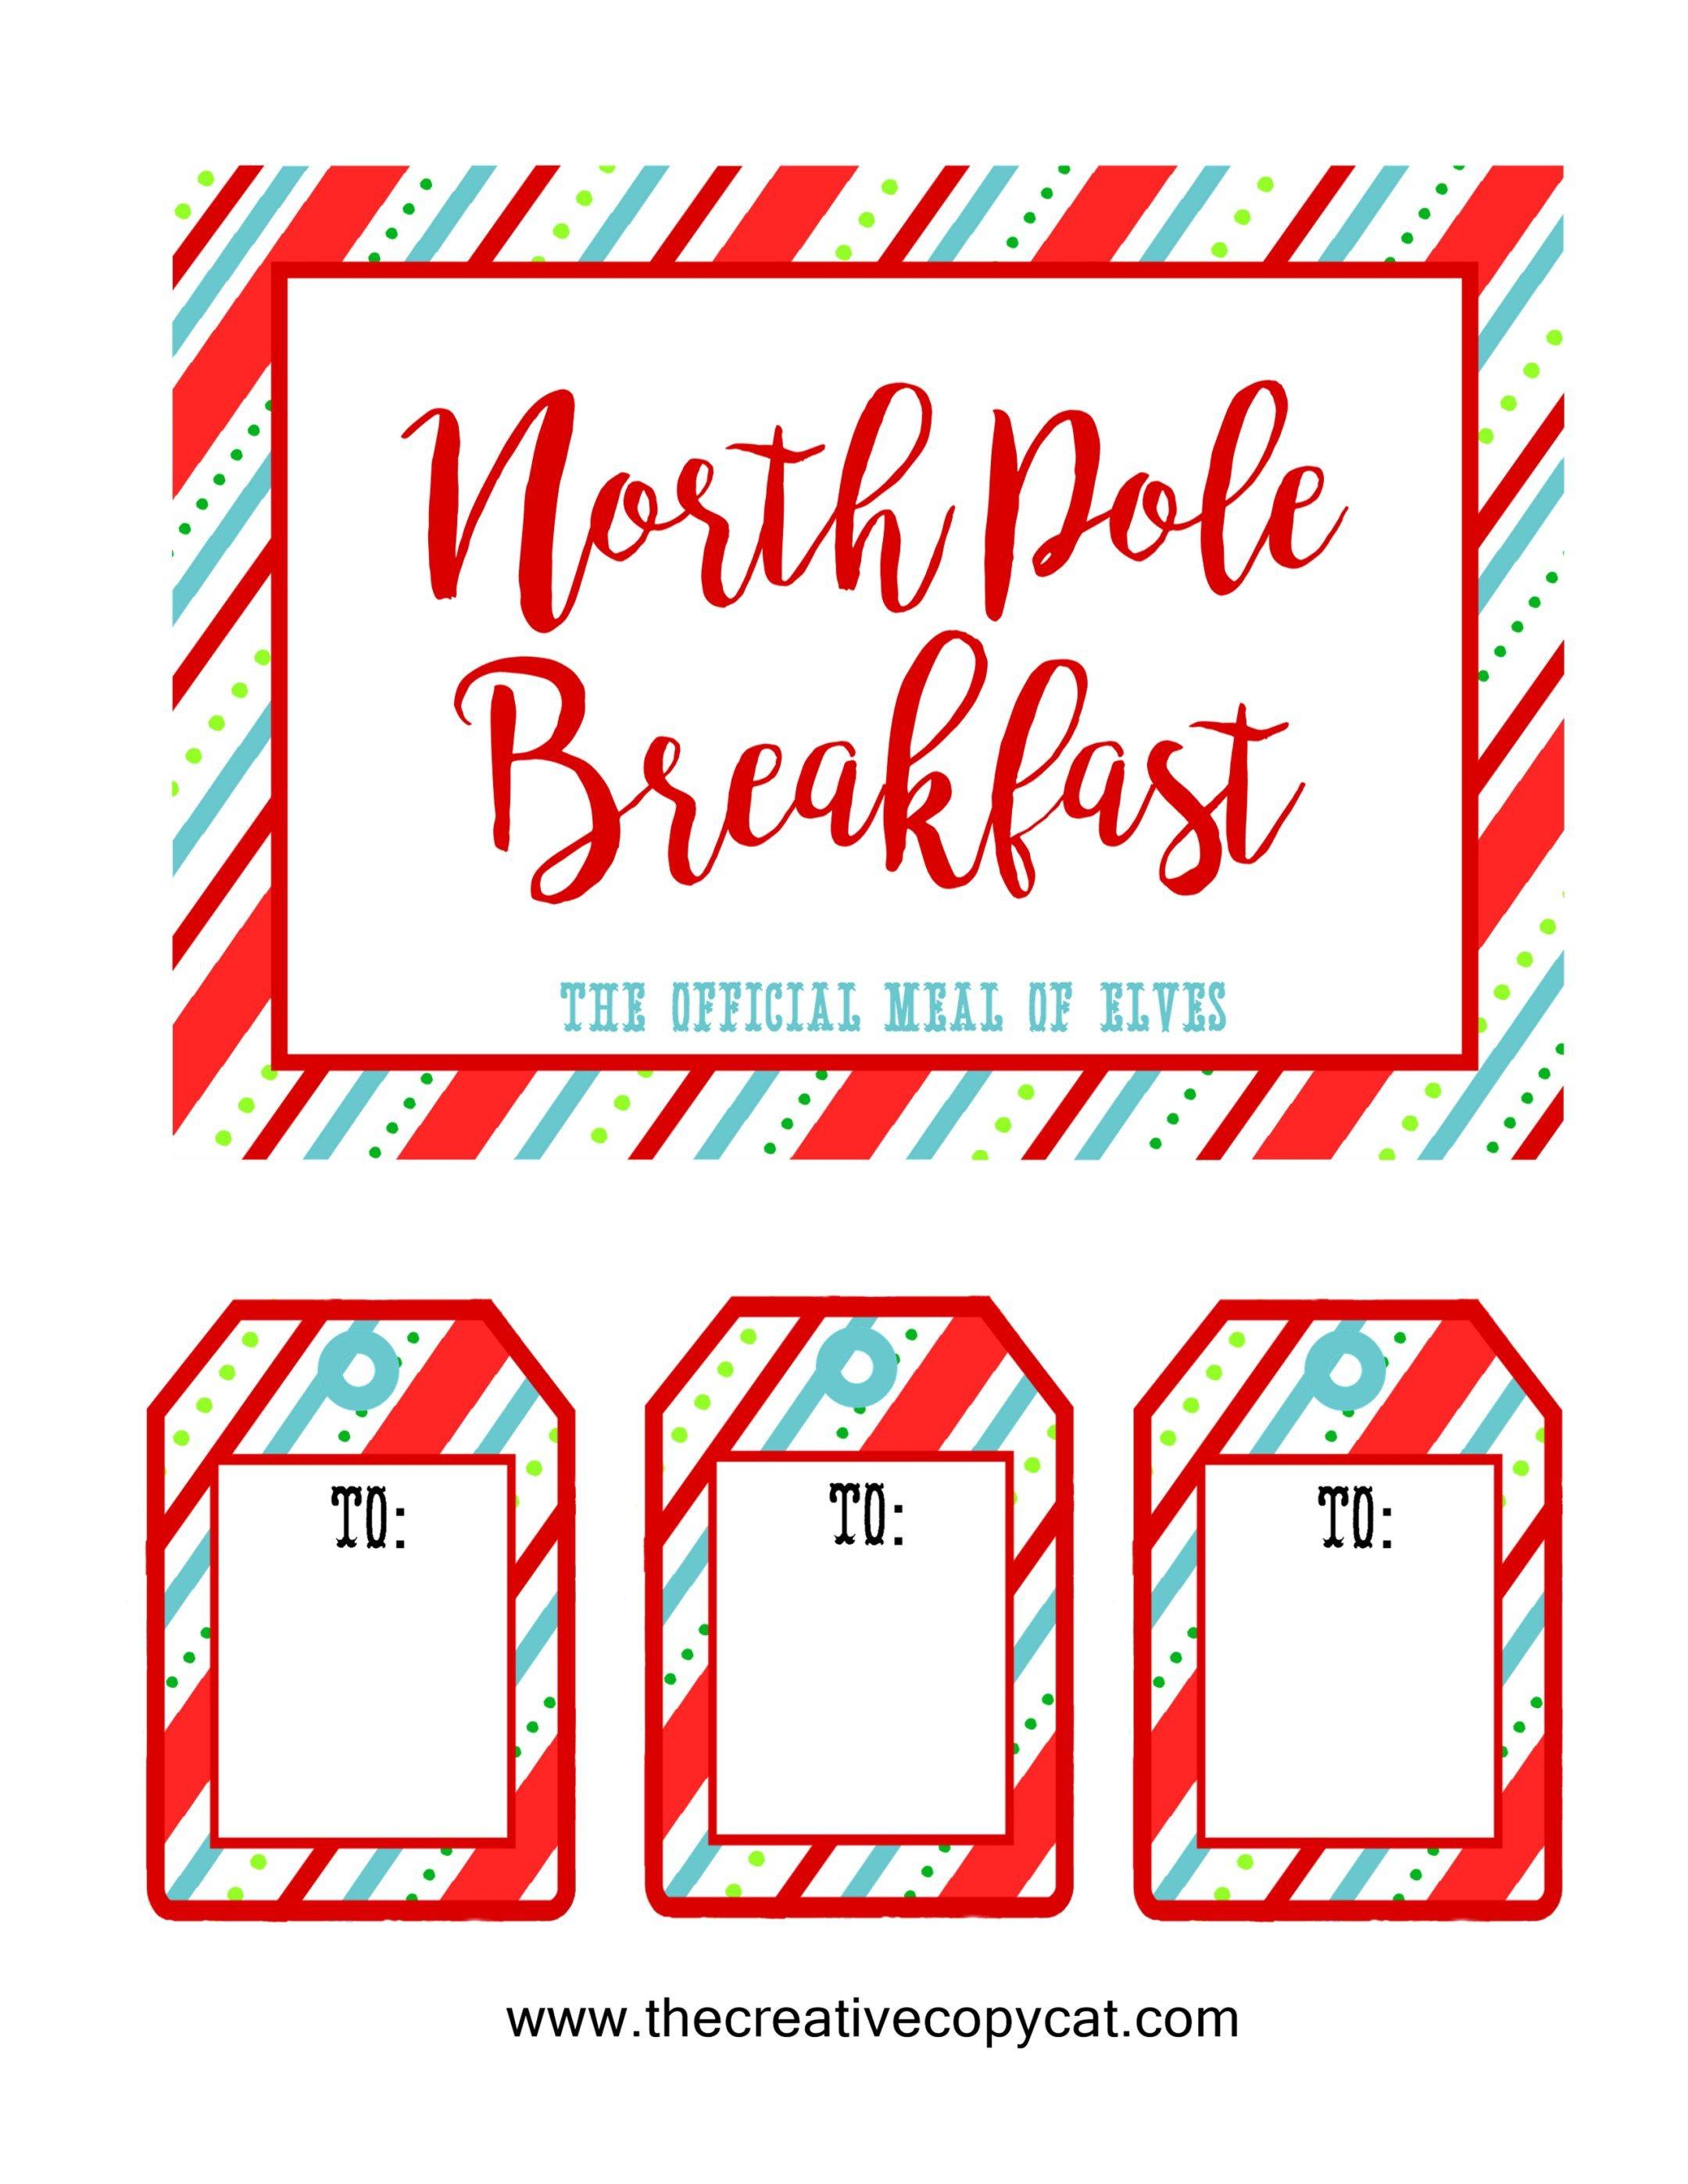 north pole breakfast free printable for elf on the shelf arrival #elfontheshelfarrival